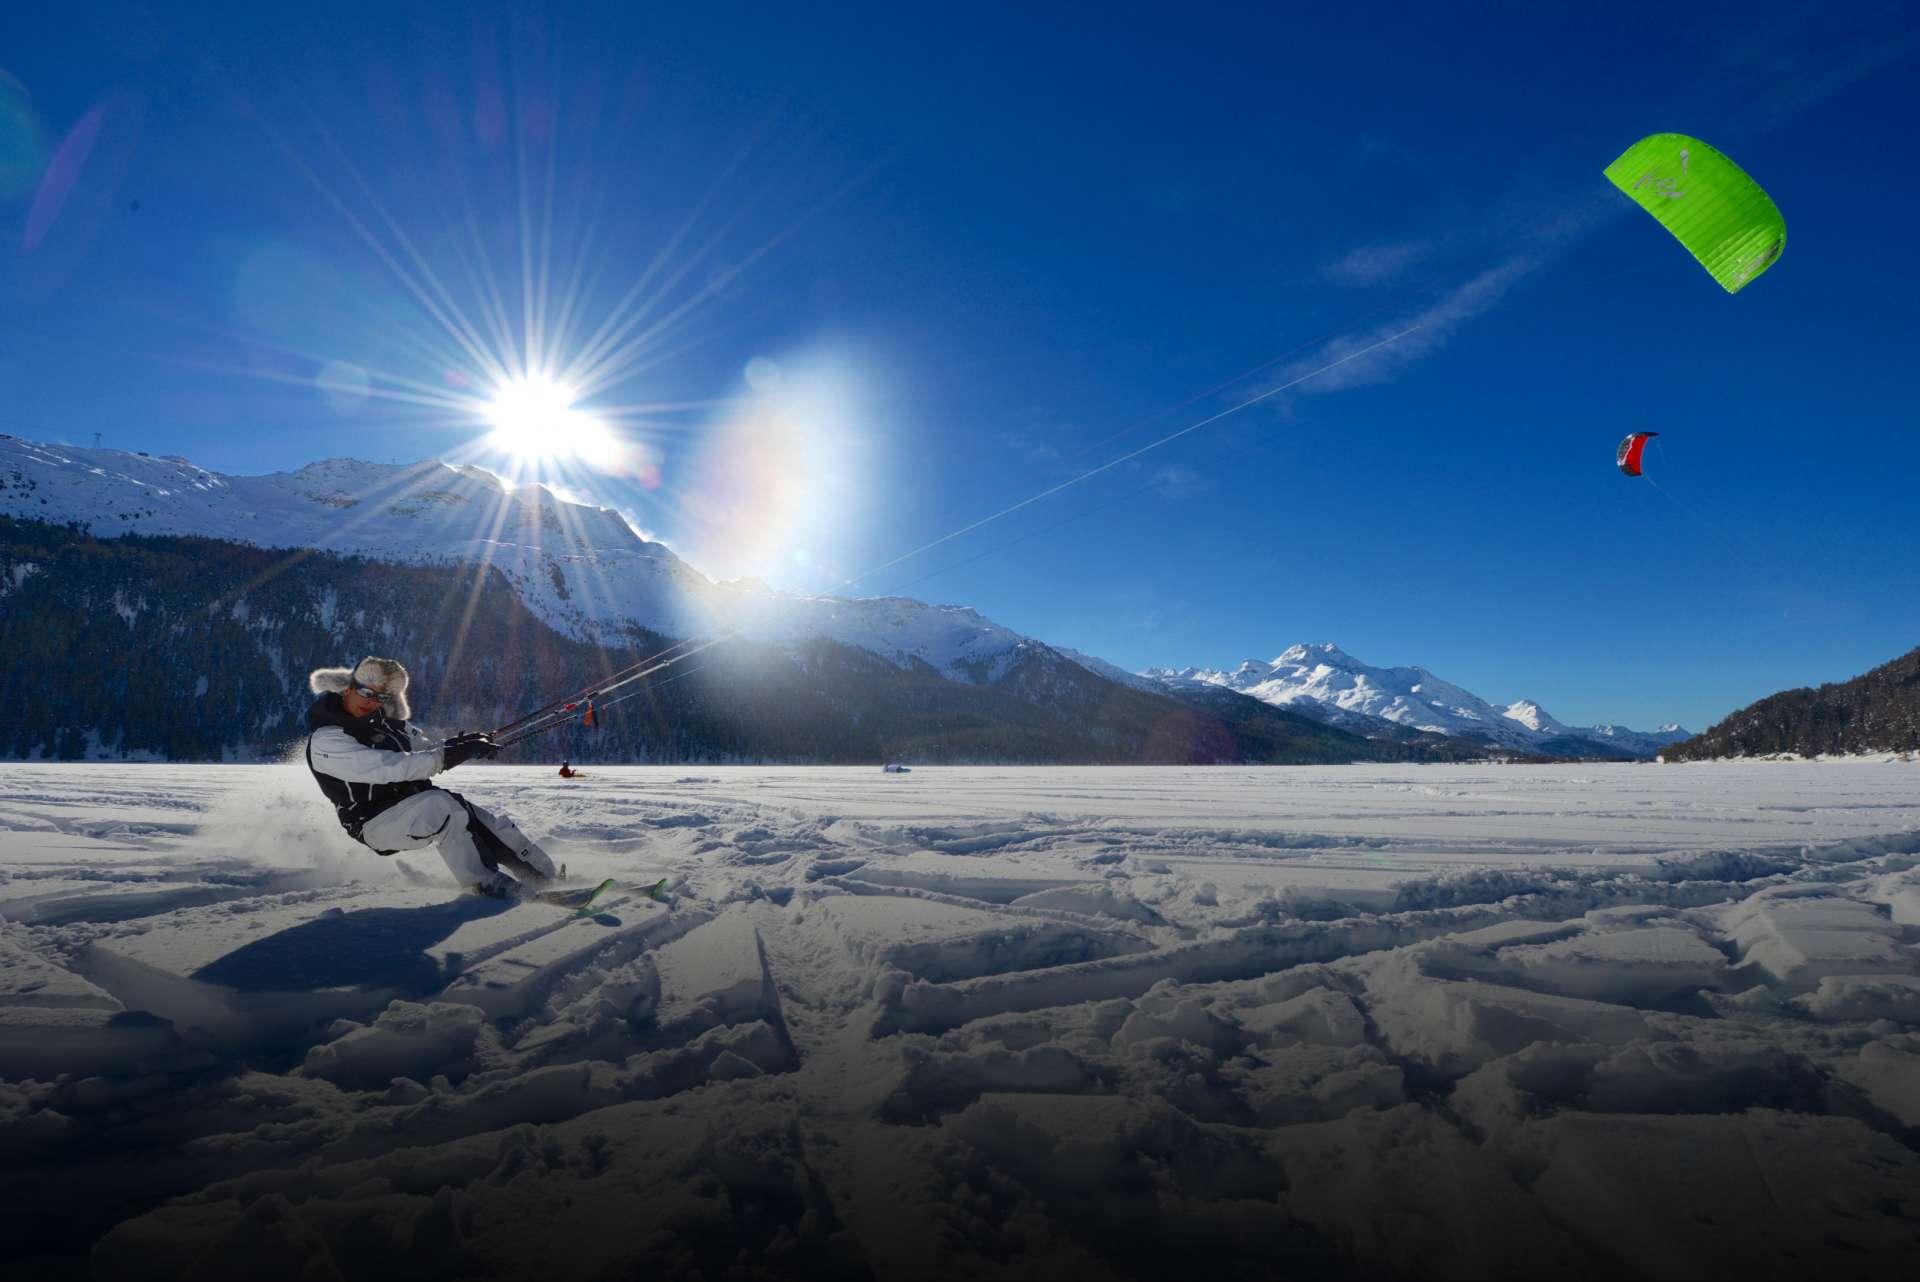 A person alpine snowkiting